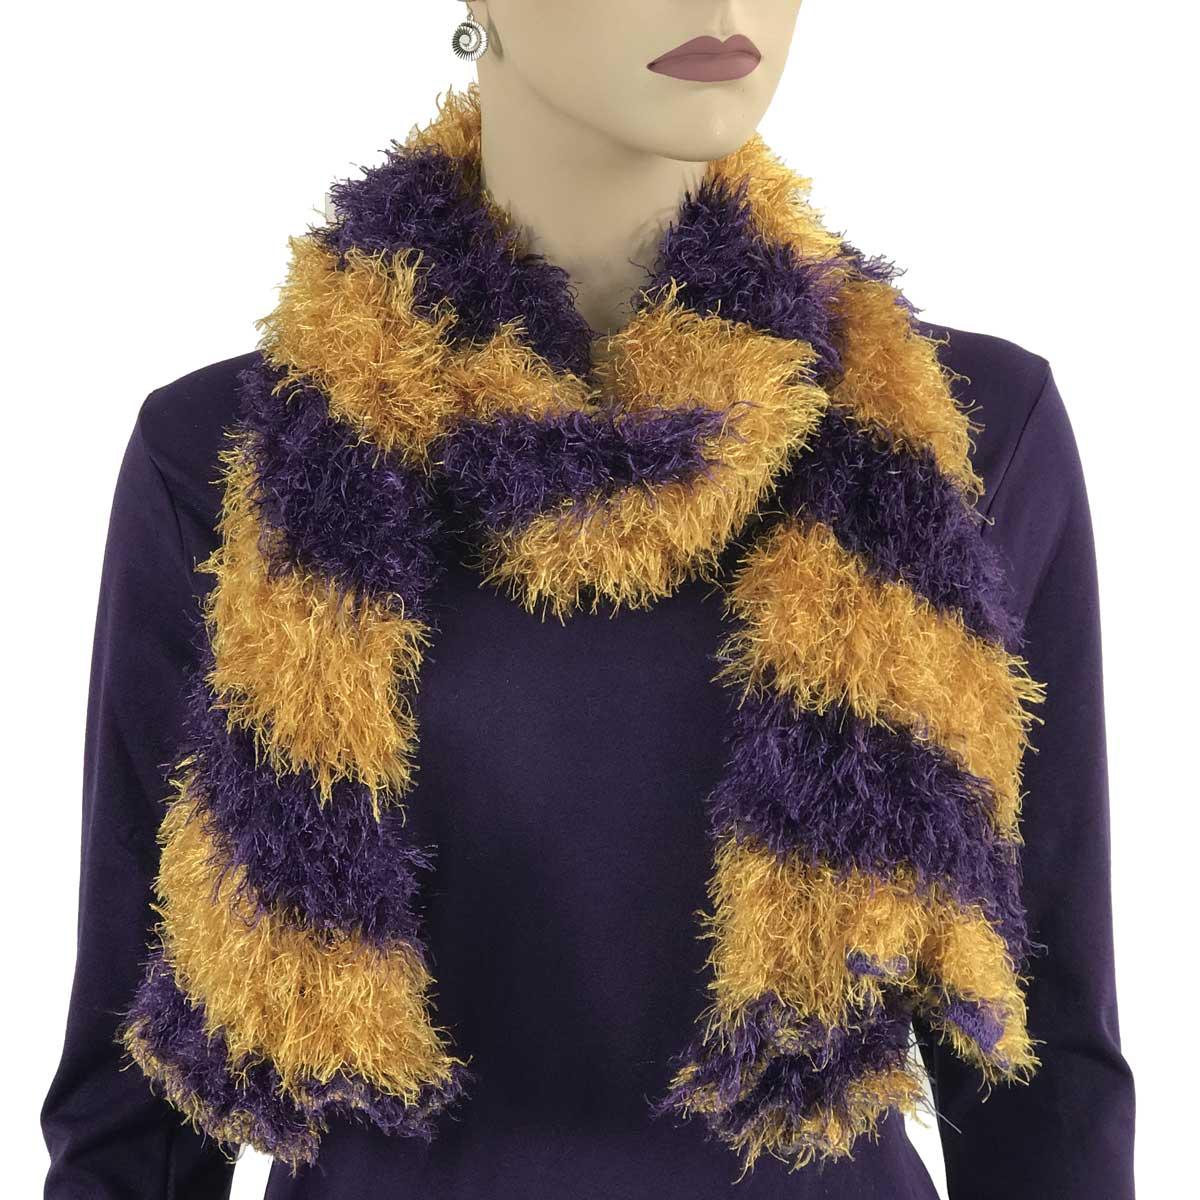 Wholesale Original Moa Boa Magic Scarves Stripes Purple-Honey -